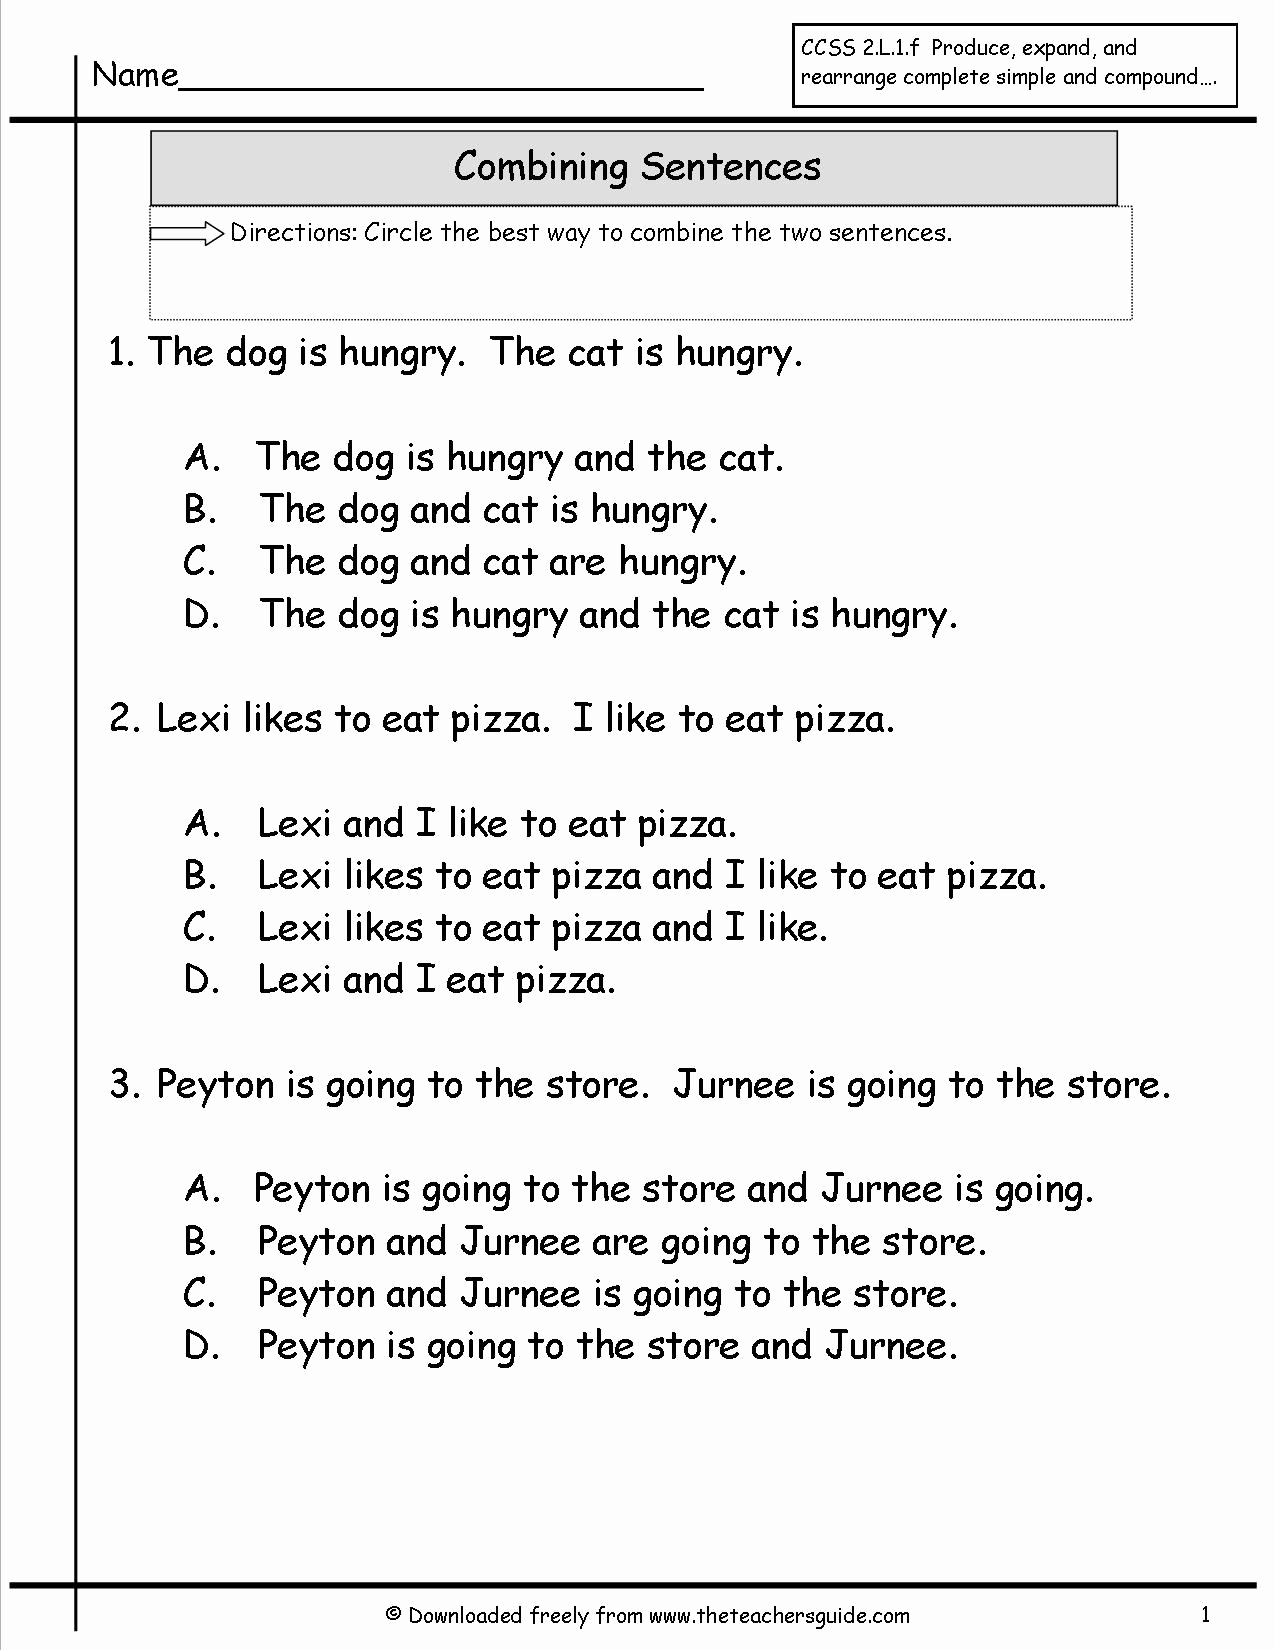 Scrambled Sentences Worksheets 3rd Grade Luxury 20 Scrambled Sentences Worksheets 3rd Grade